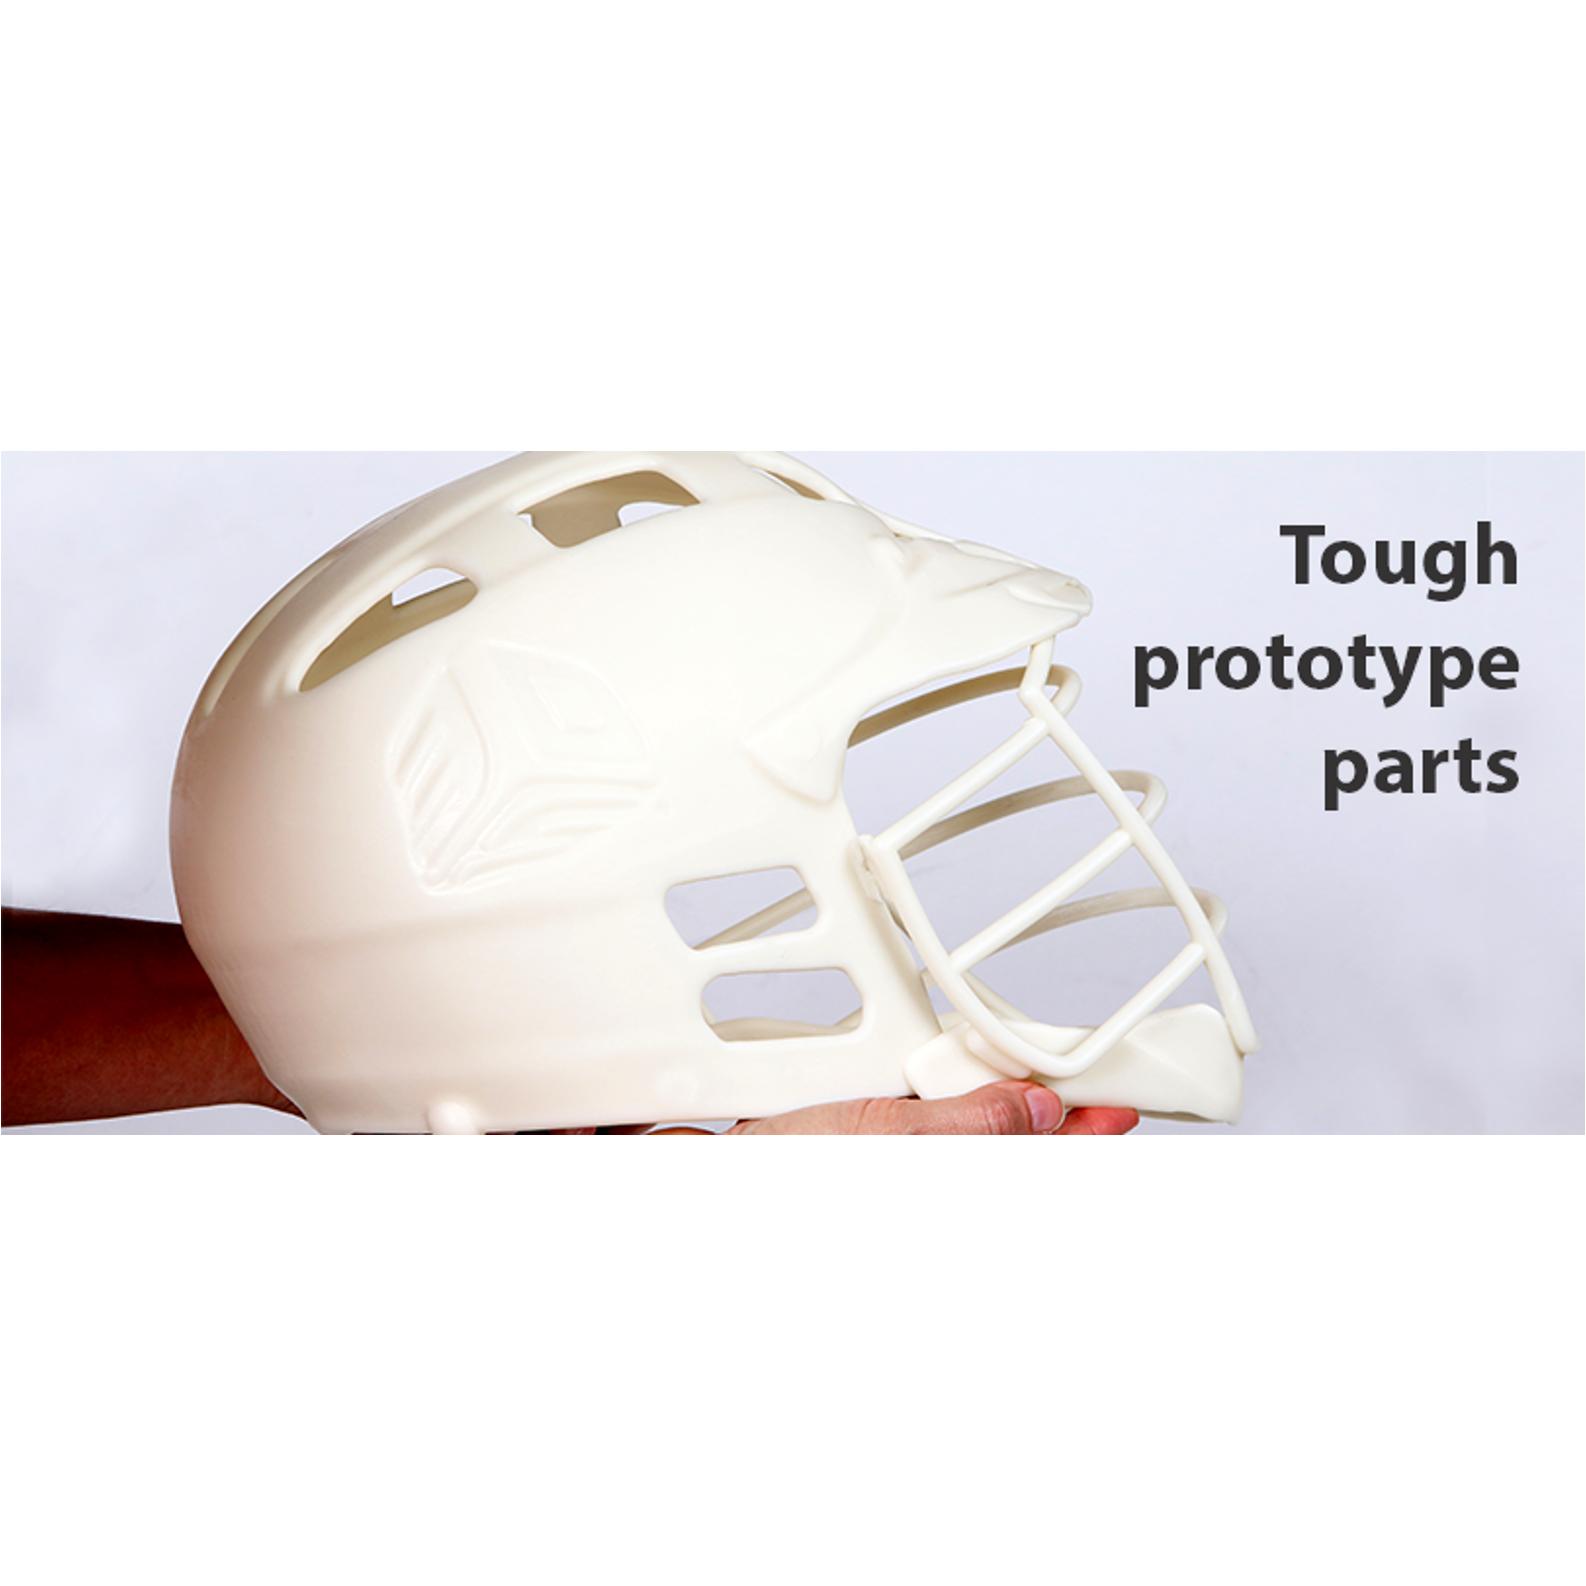 sla-800-lacrosse-accura25-web3.png